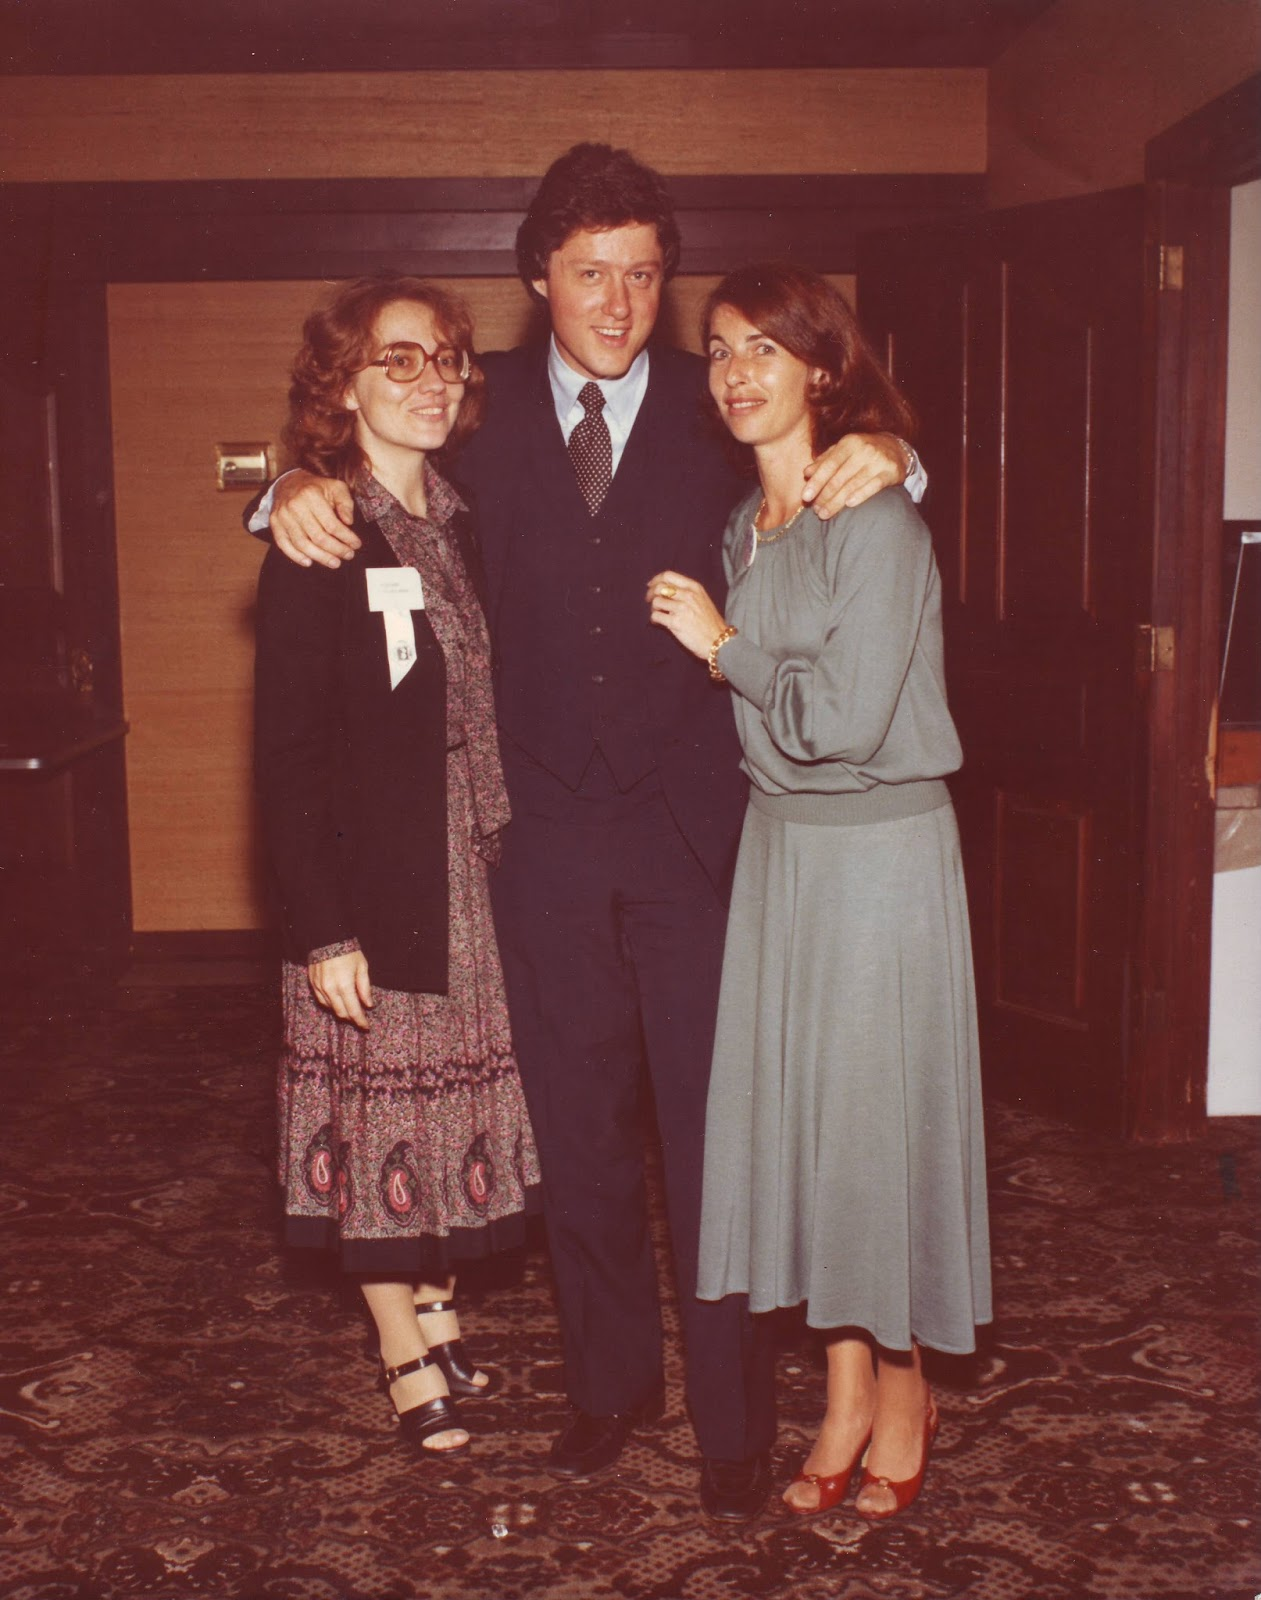 bill clinton 1975 - photo #23